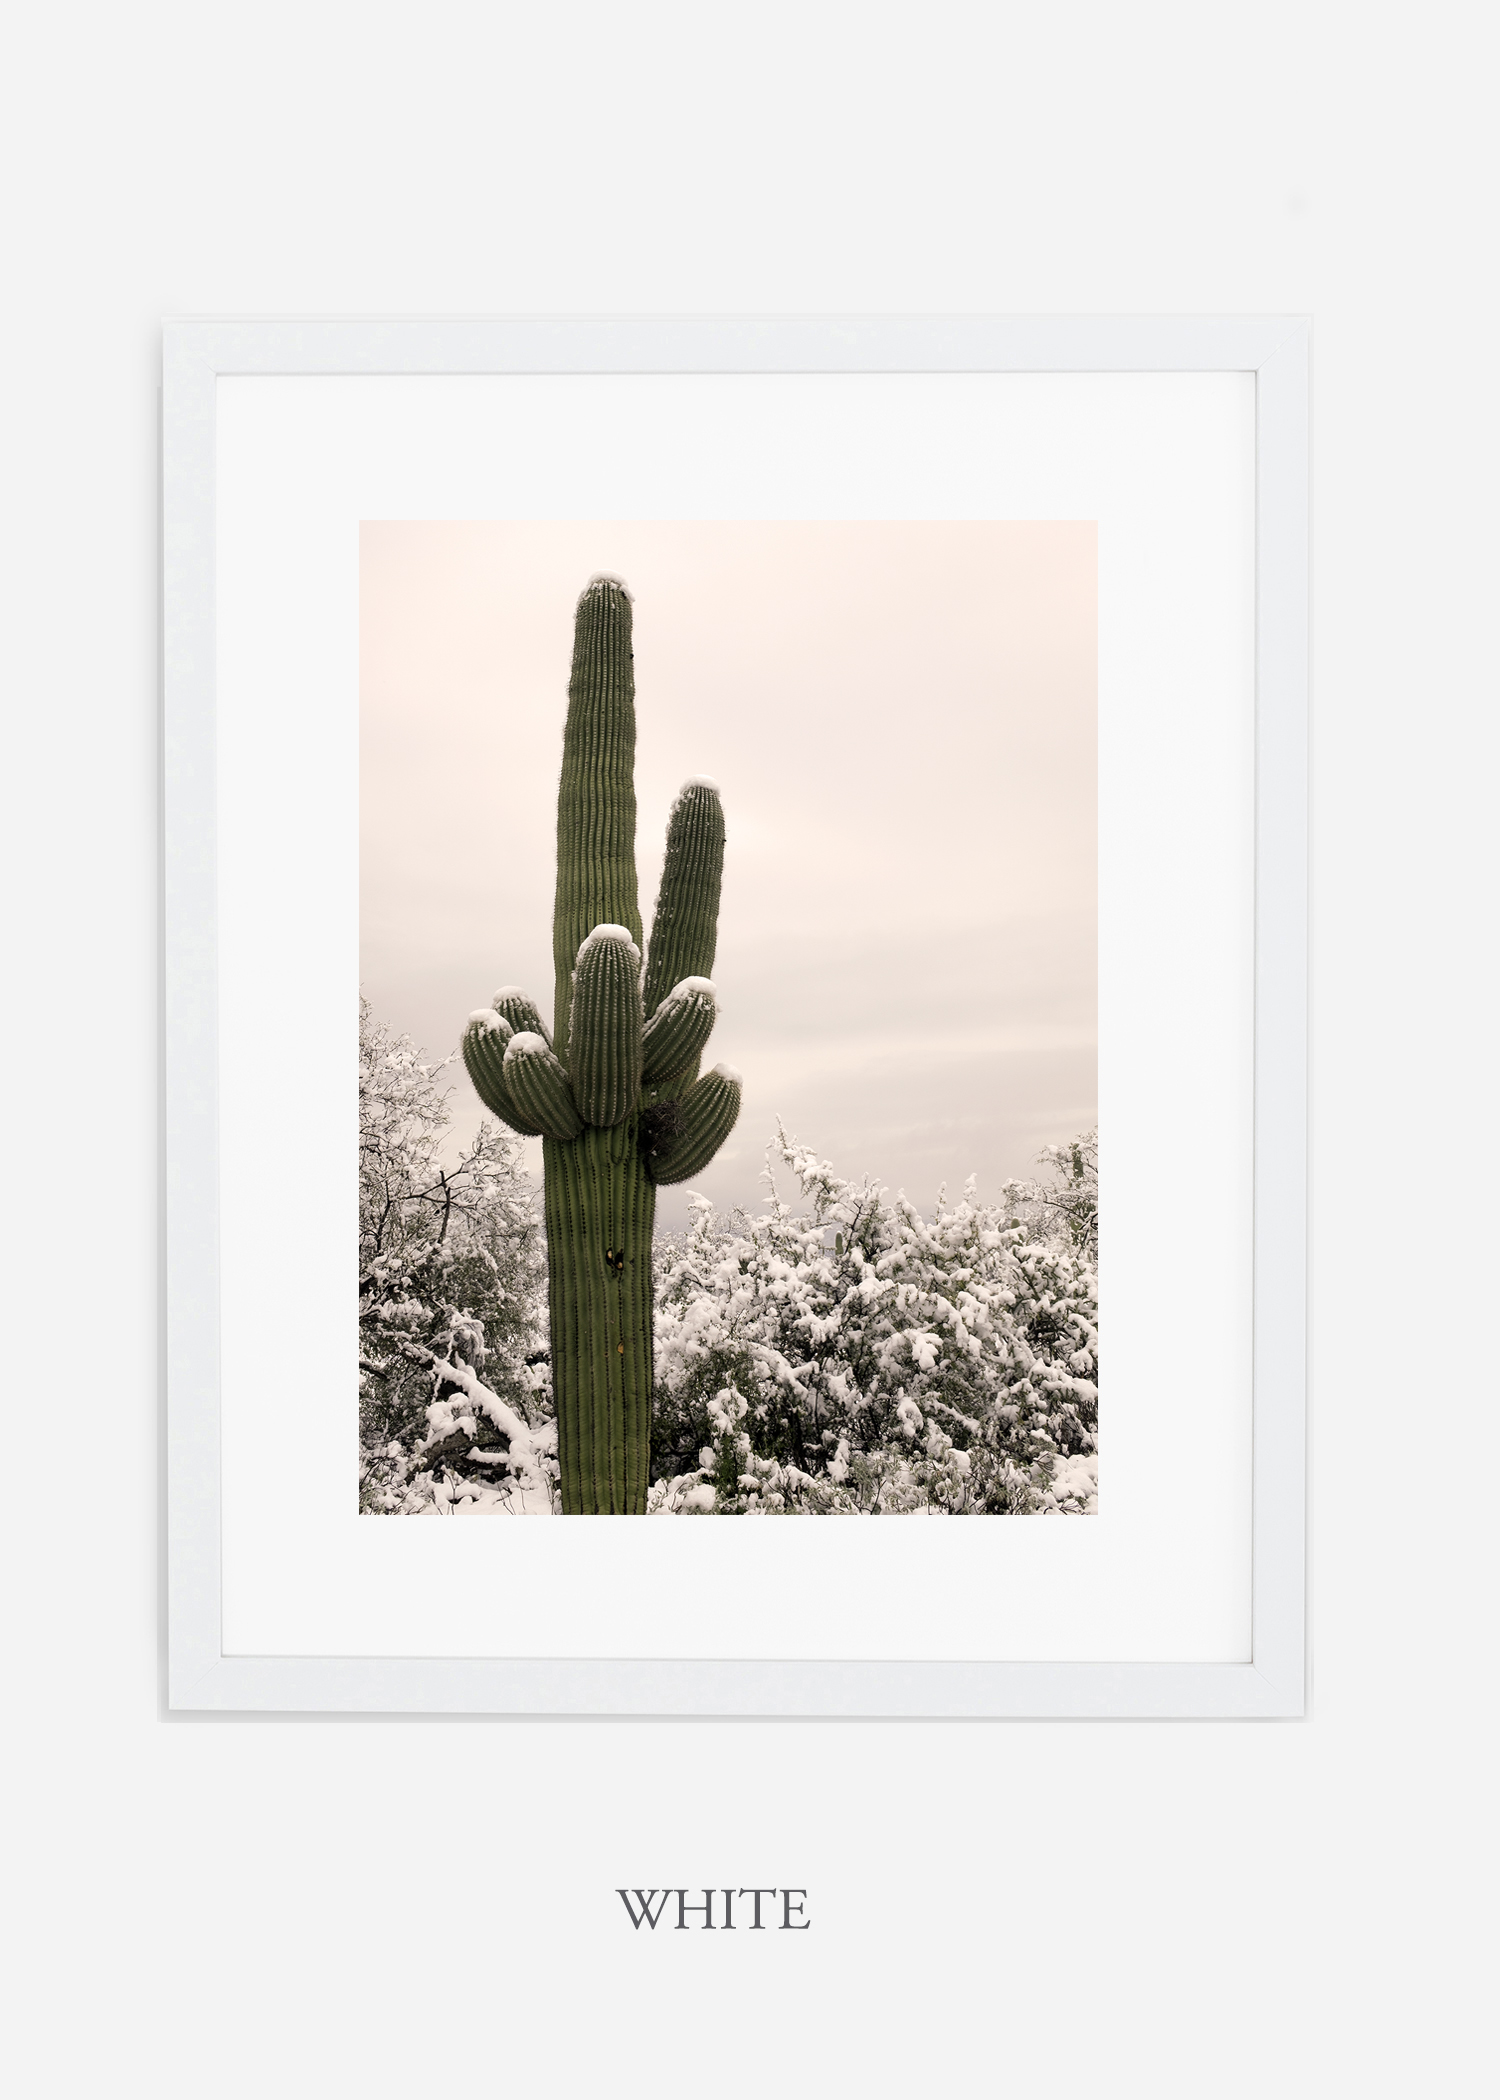 whiteframe-saguaroNo.6-wildercalifornia-art-wallart-cactusprint-homedecor-prints-arizona-botanical-artwork-interiordesign.jpg